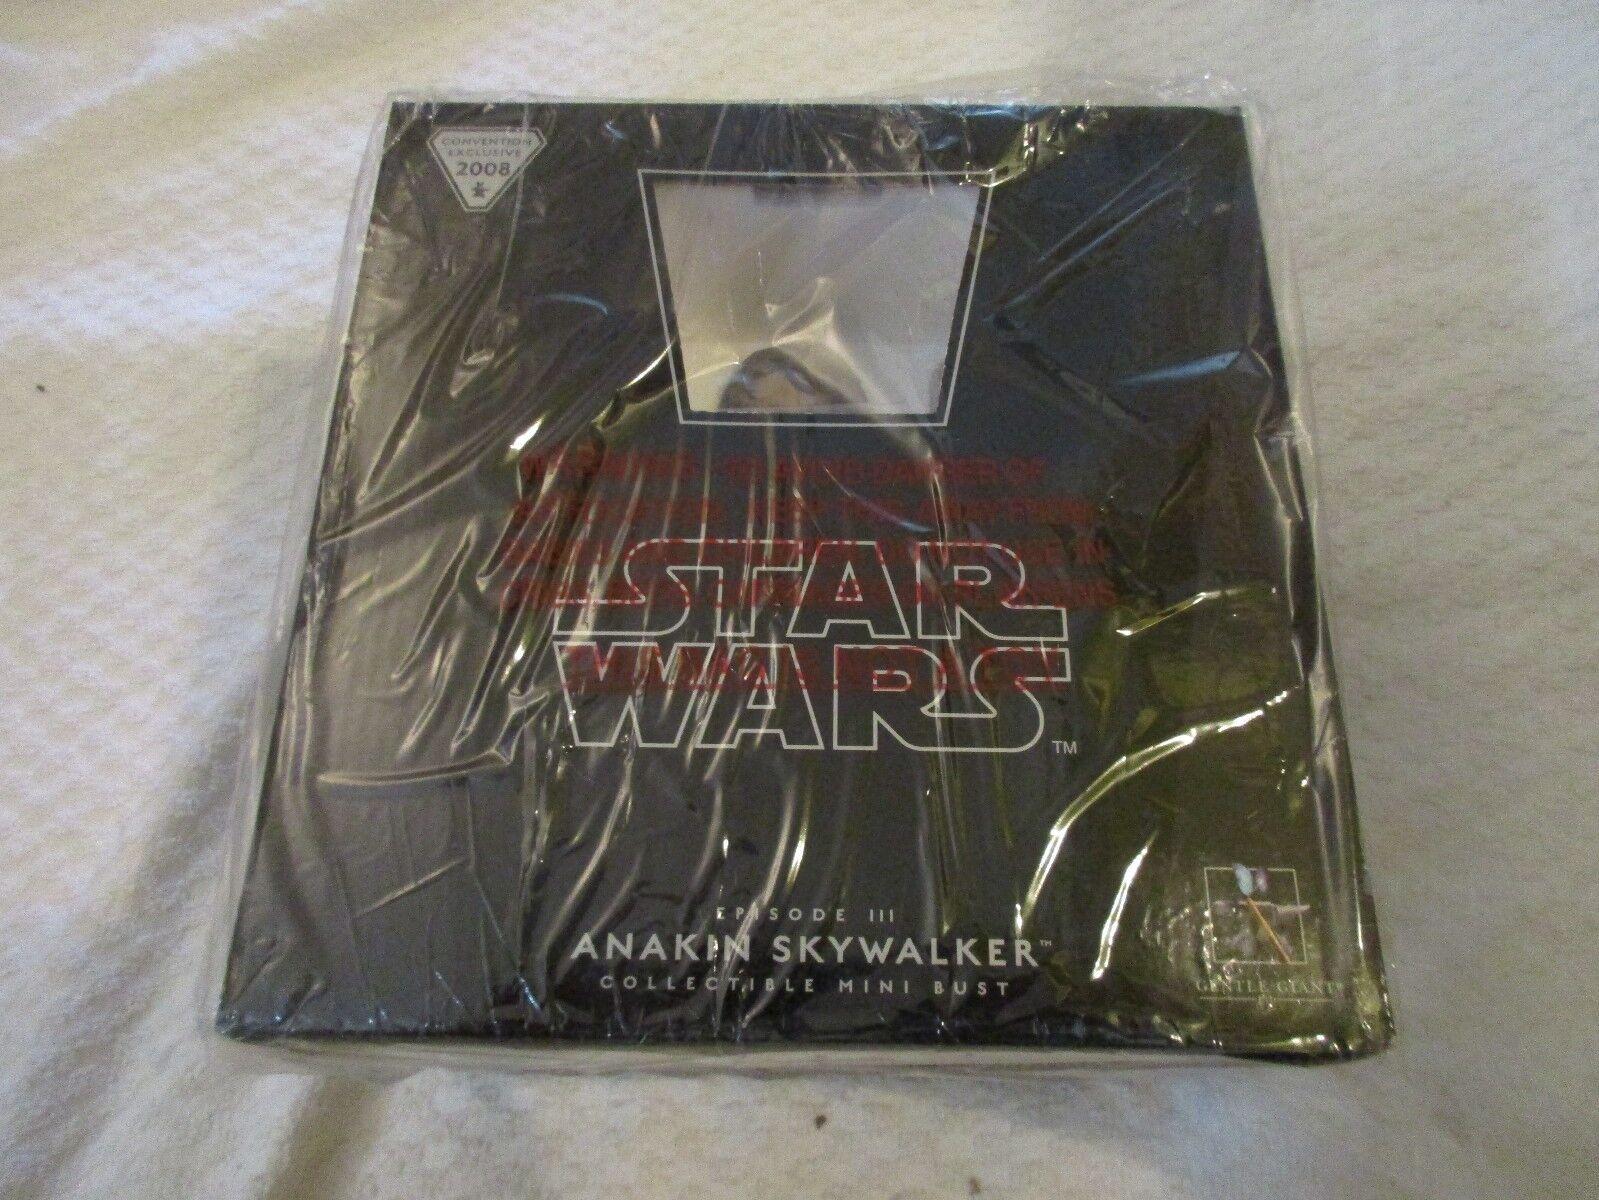 Gentle Giant Star Wars Episode III 3 Anakin Skywalker Mini Bust  2083 3500